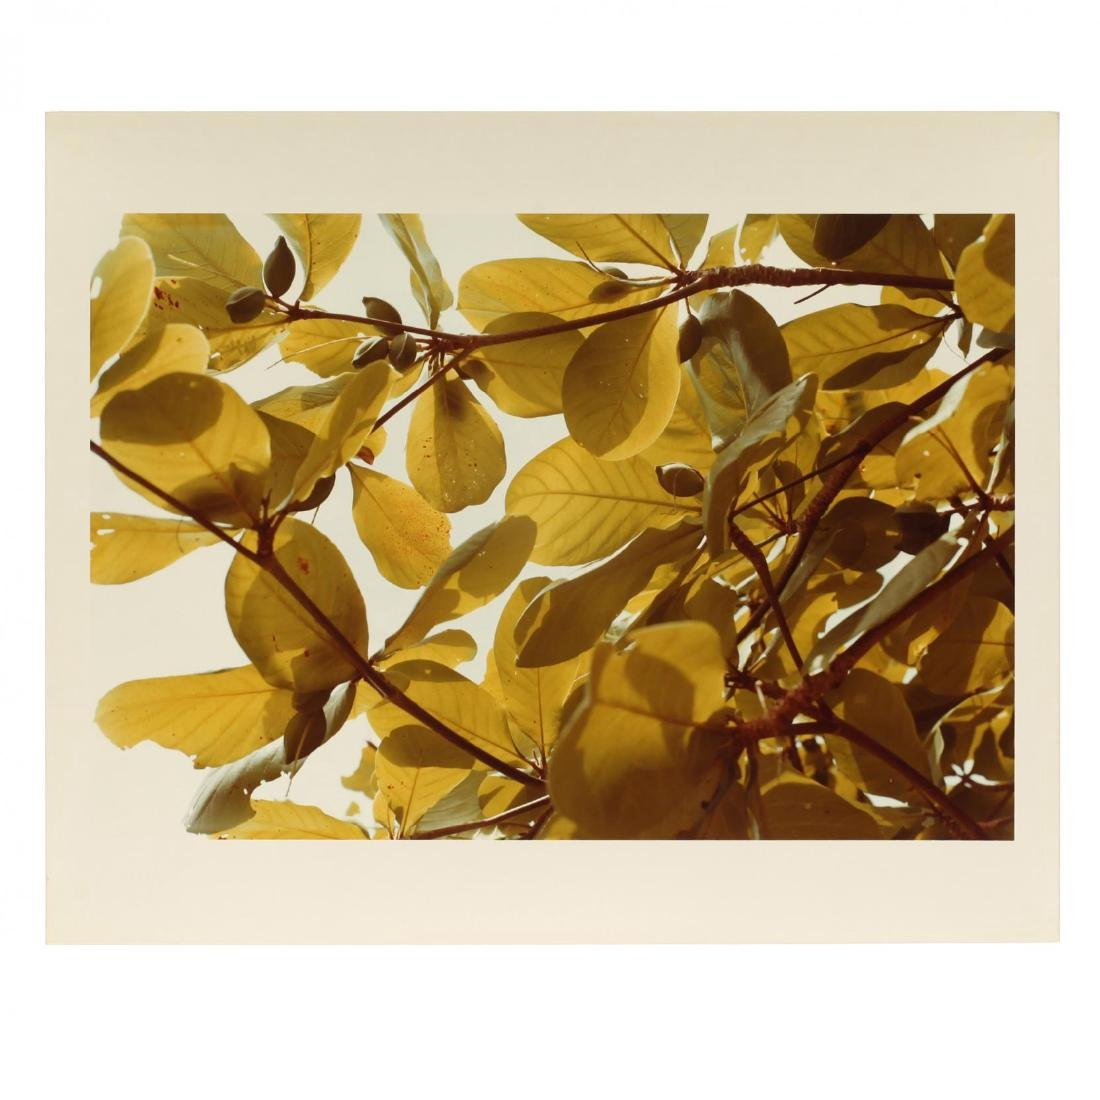 William Eggleston (American, b. 1939), Untitled from